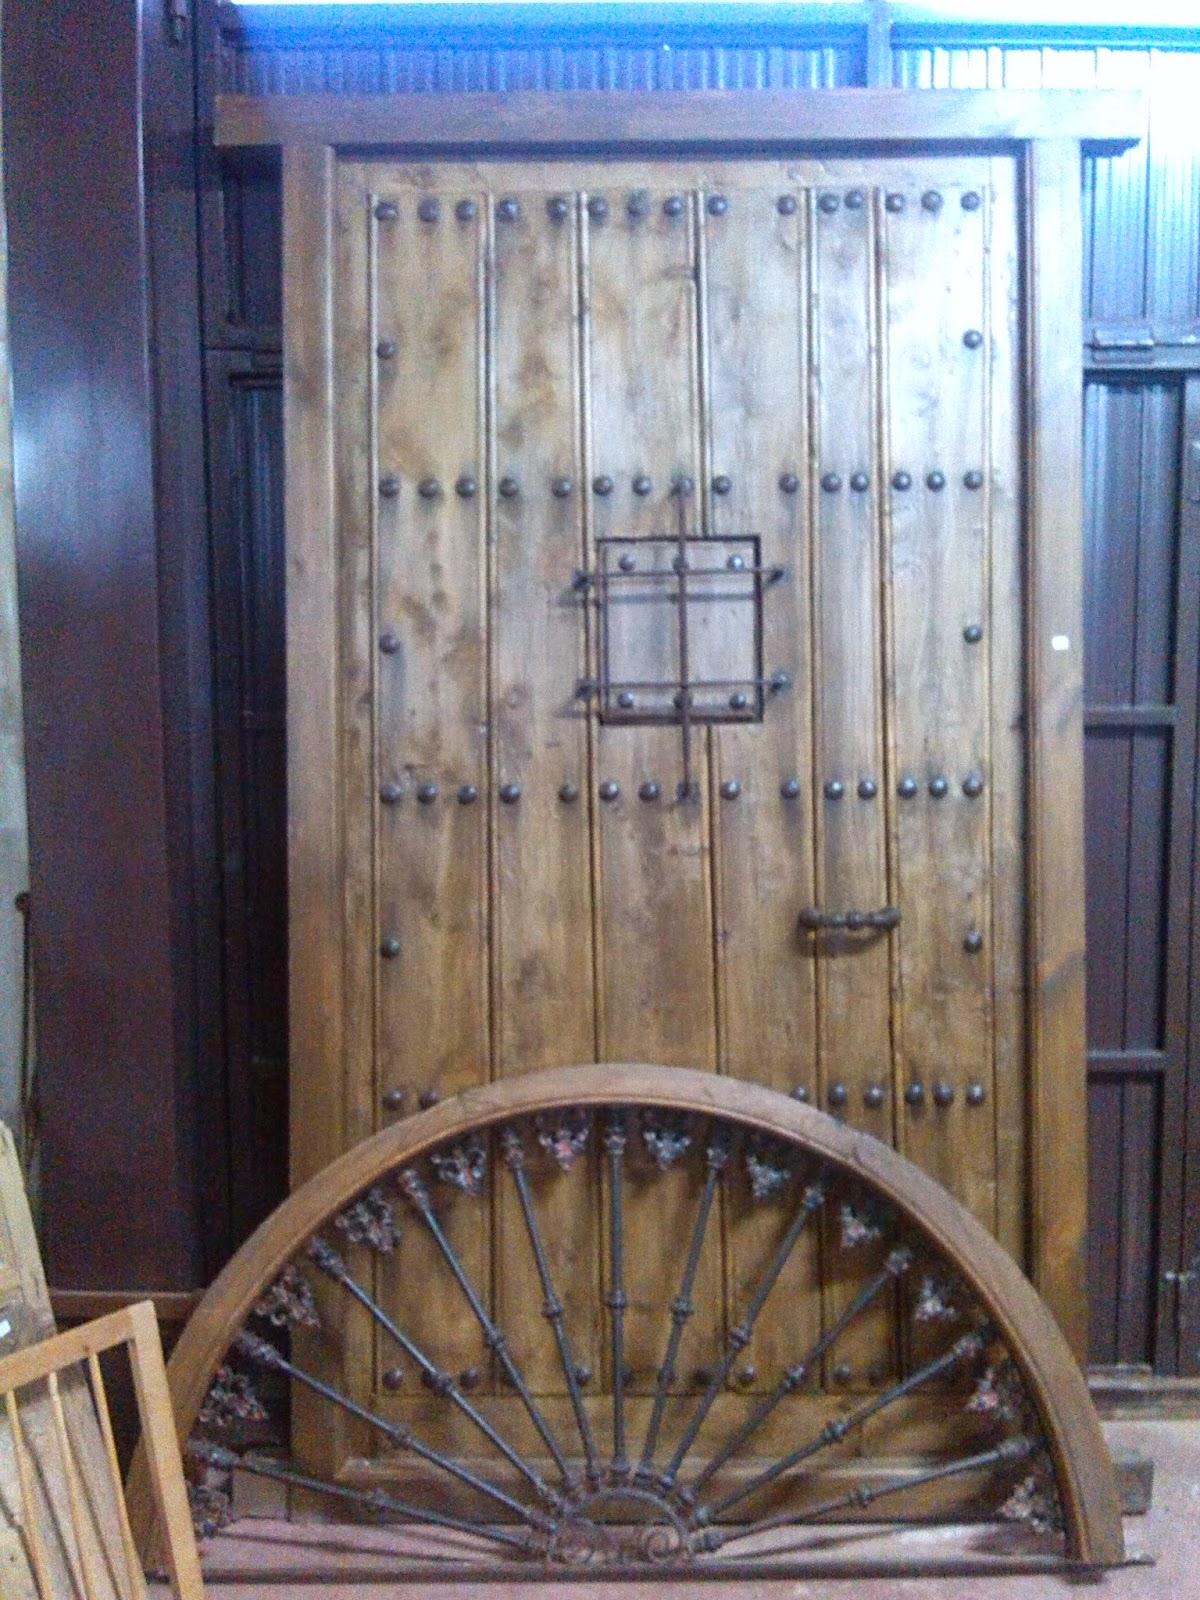 Antig edades almagro puertas ventanucos herrajes - Herrajes muebles antiguos ...